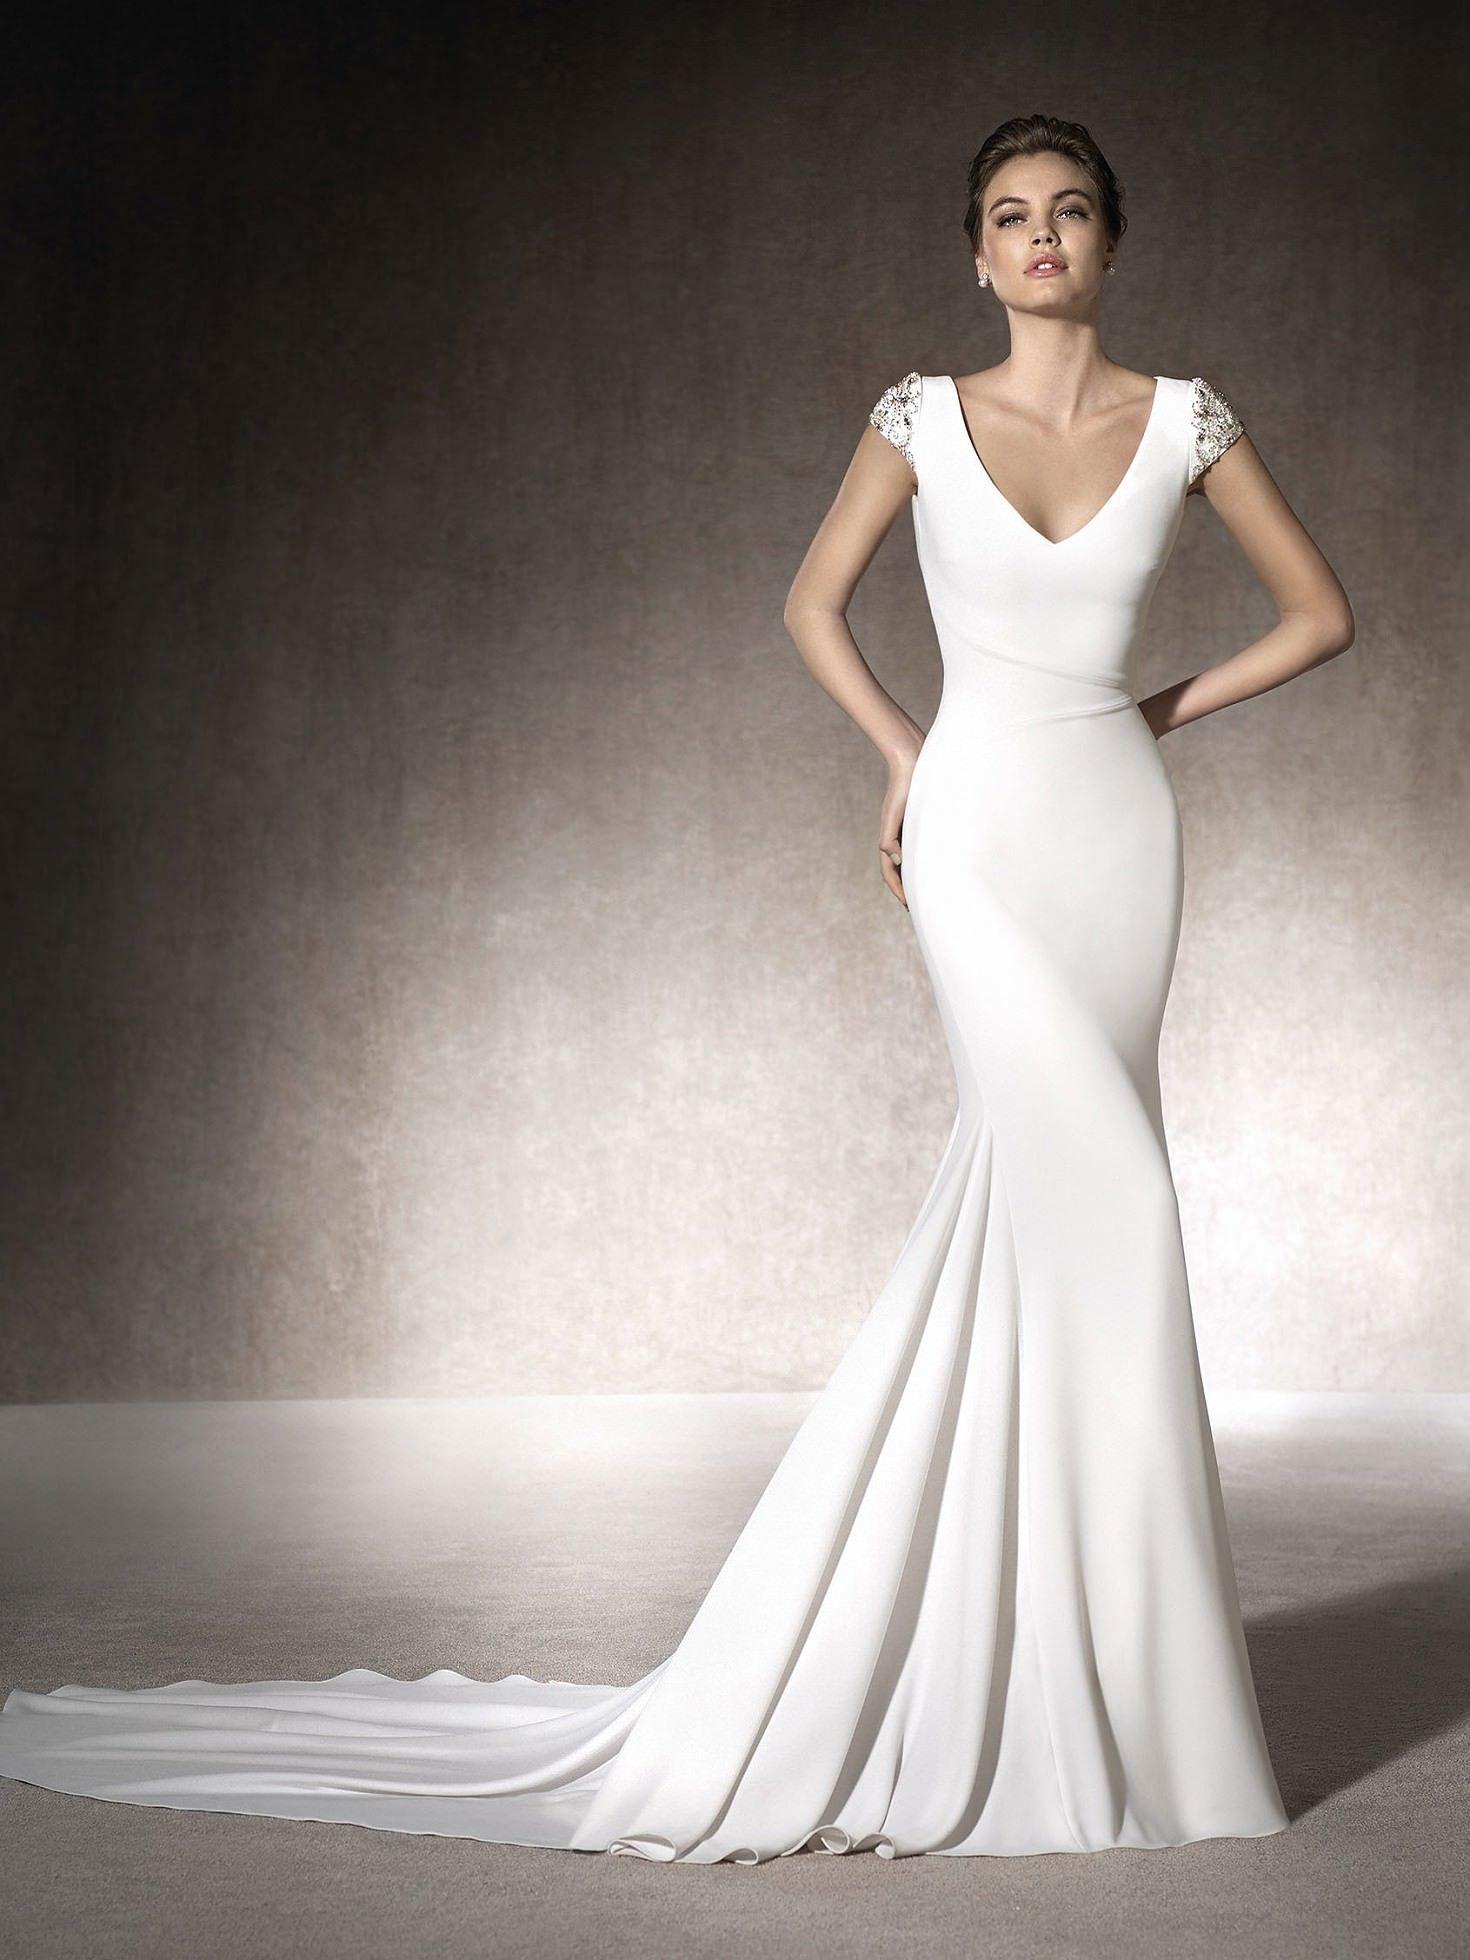 Dress 11 — Front Short sleeve wedding dress, Crepe